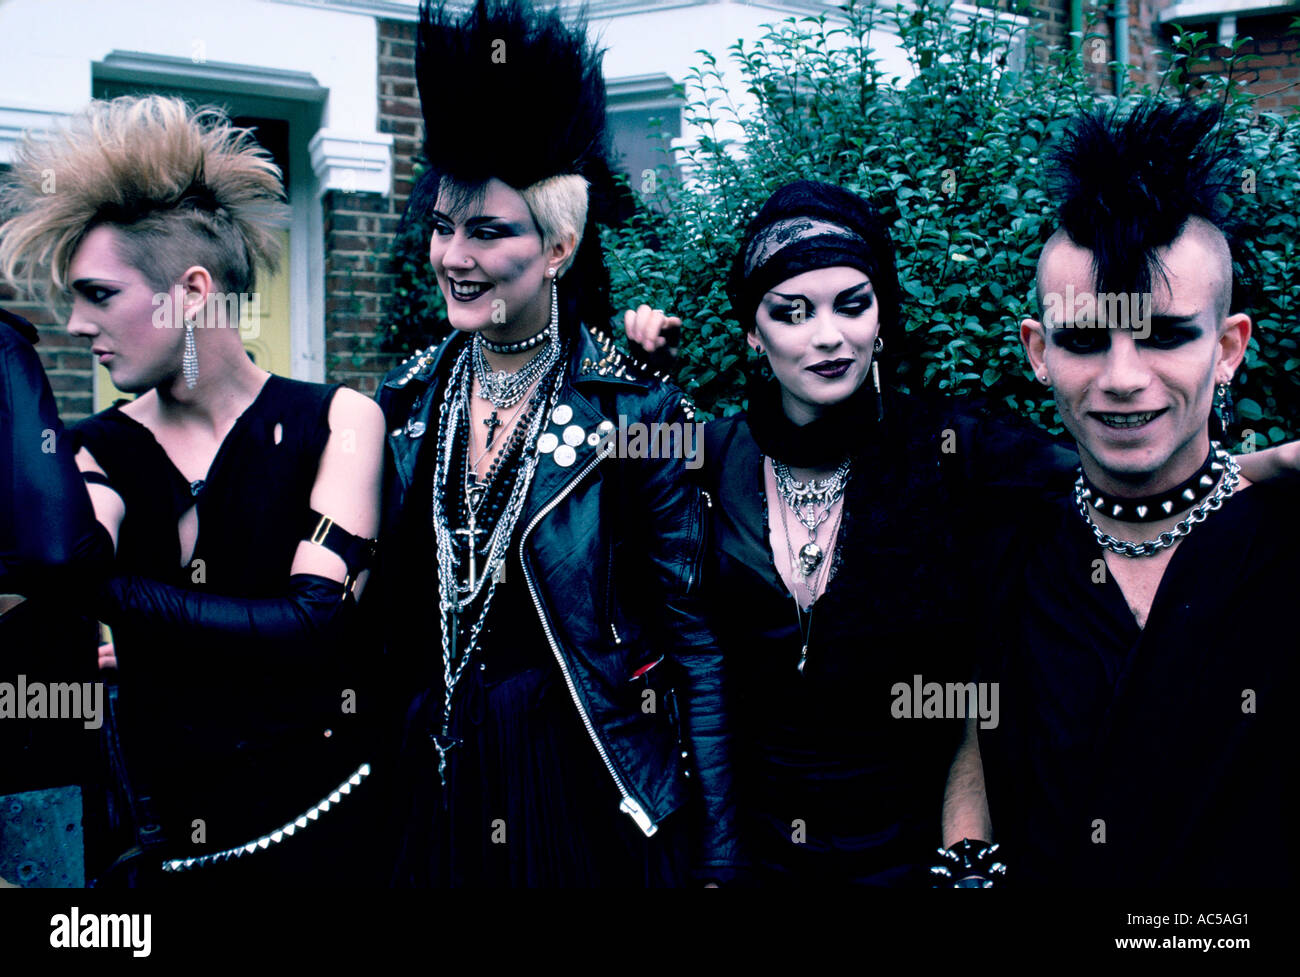 Kühlschrank Punk : London punks stockfotos london punks bilder alamy